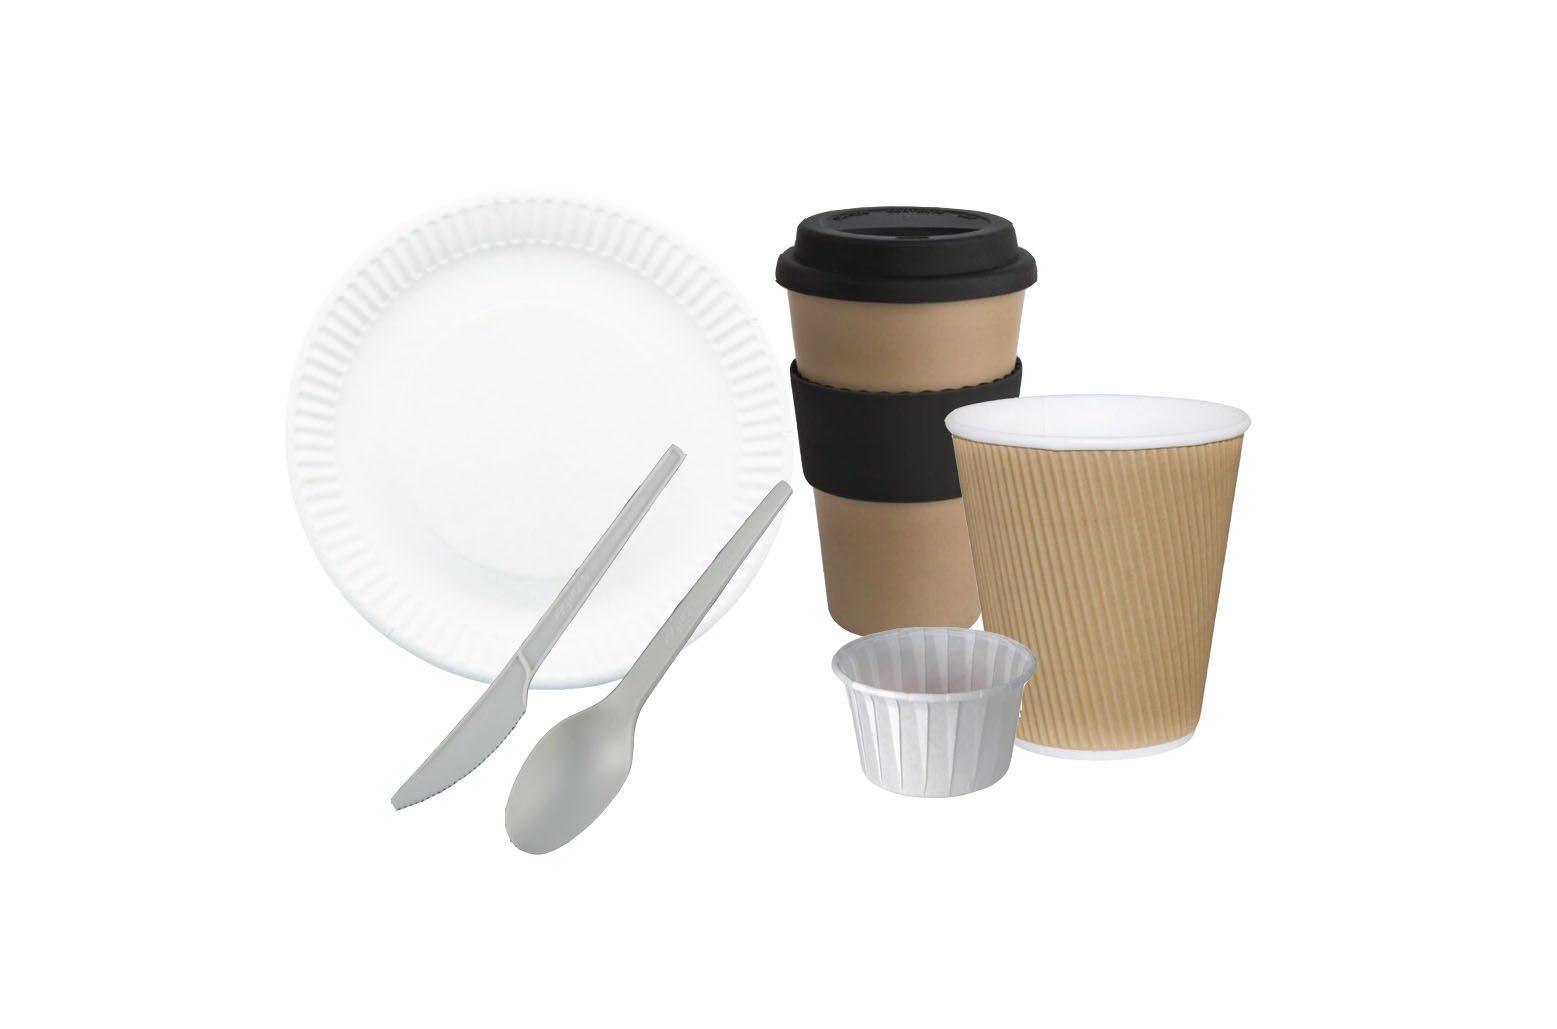 Borden bestek & koffiebekers